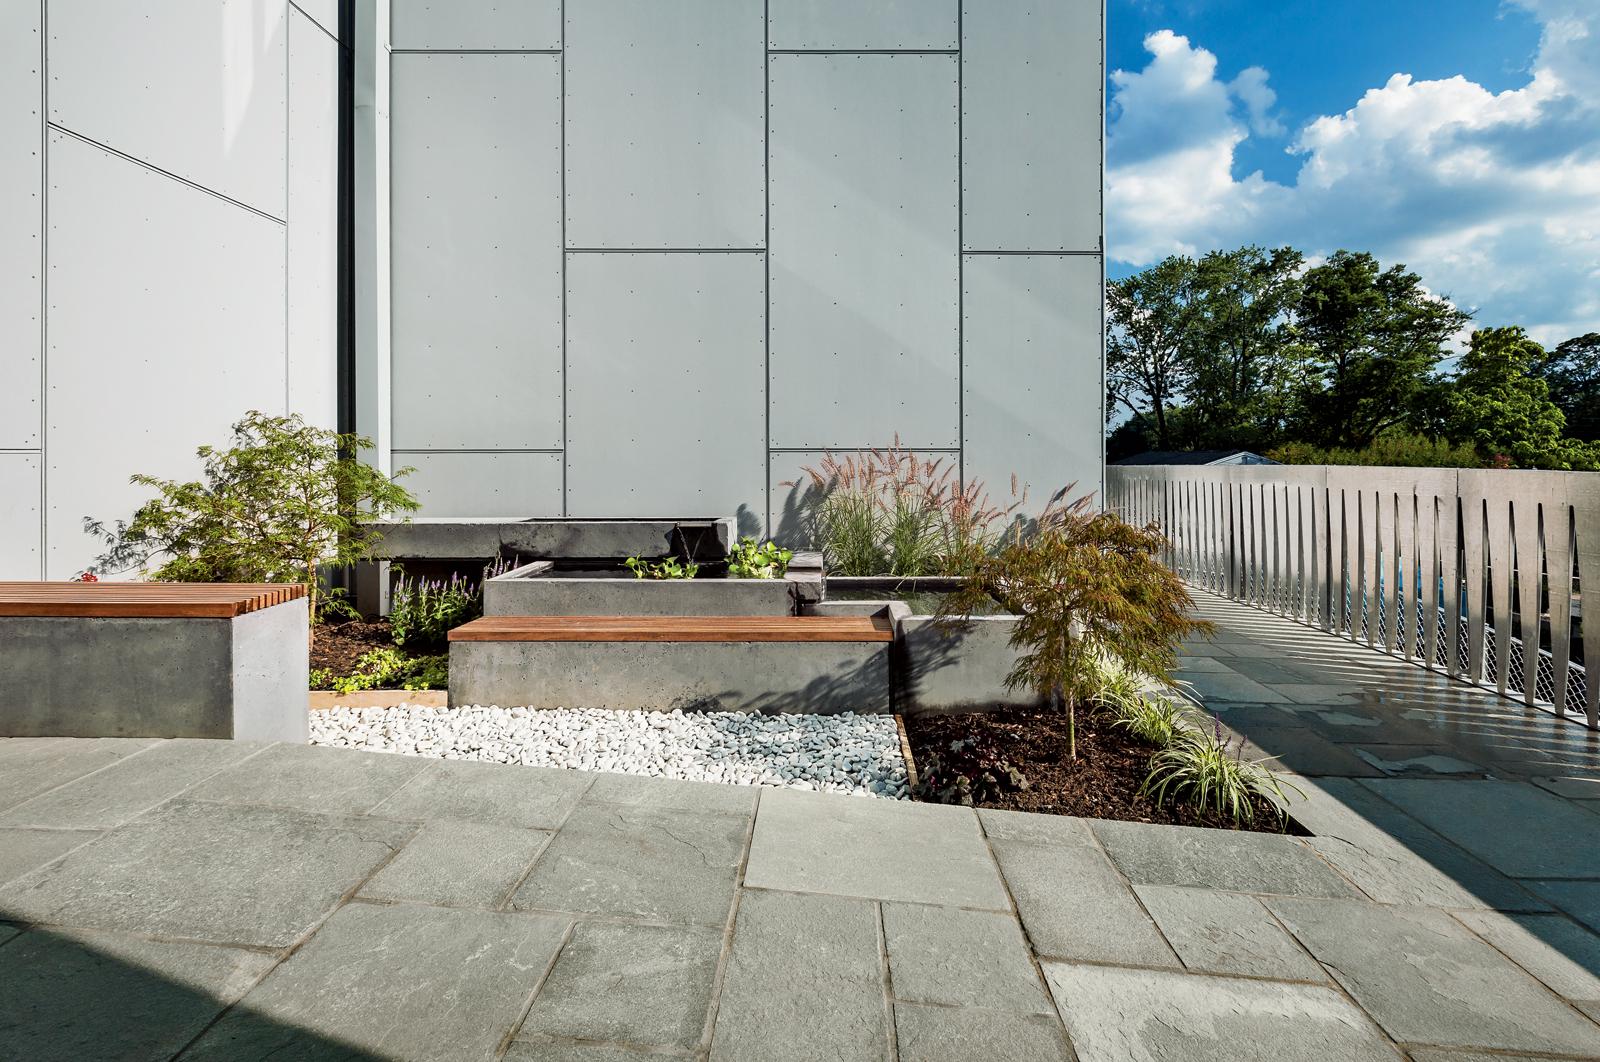 howeler yoon garden courtyard